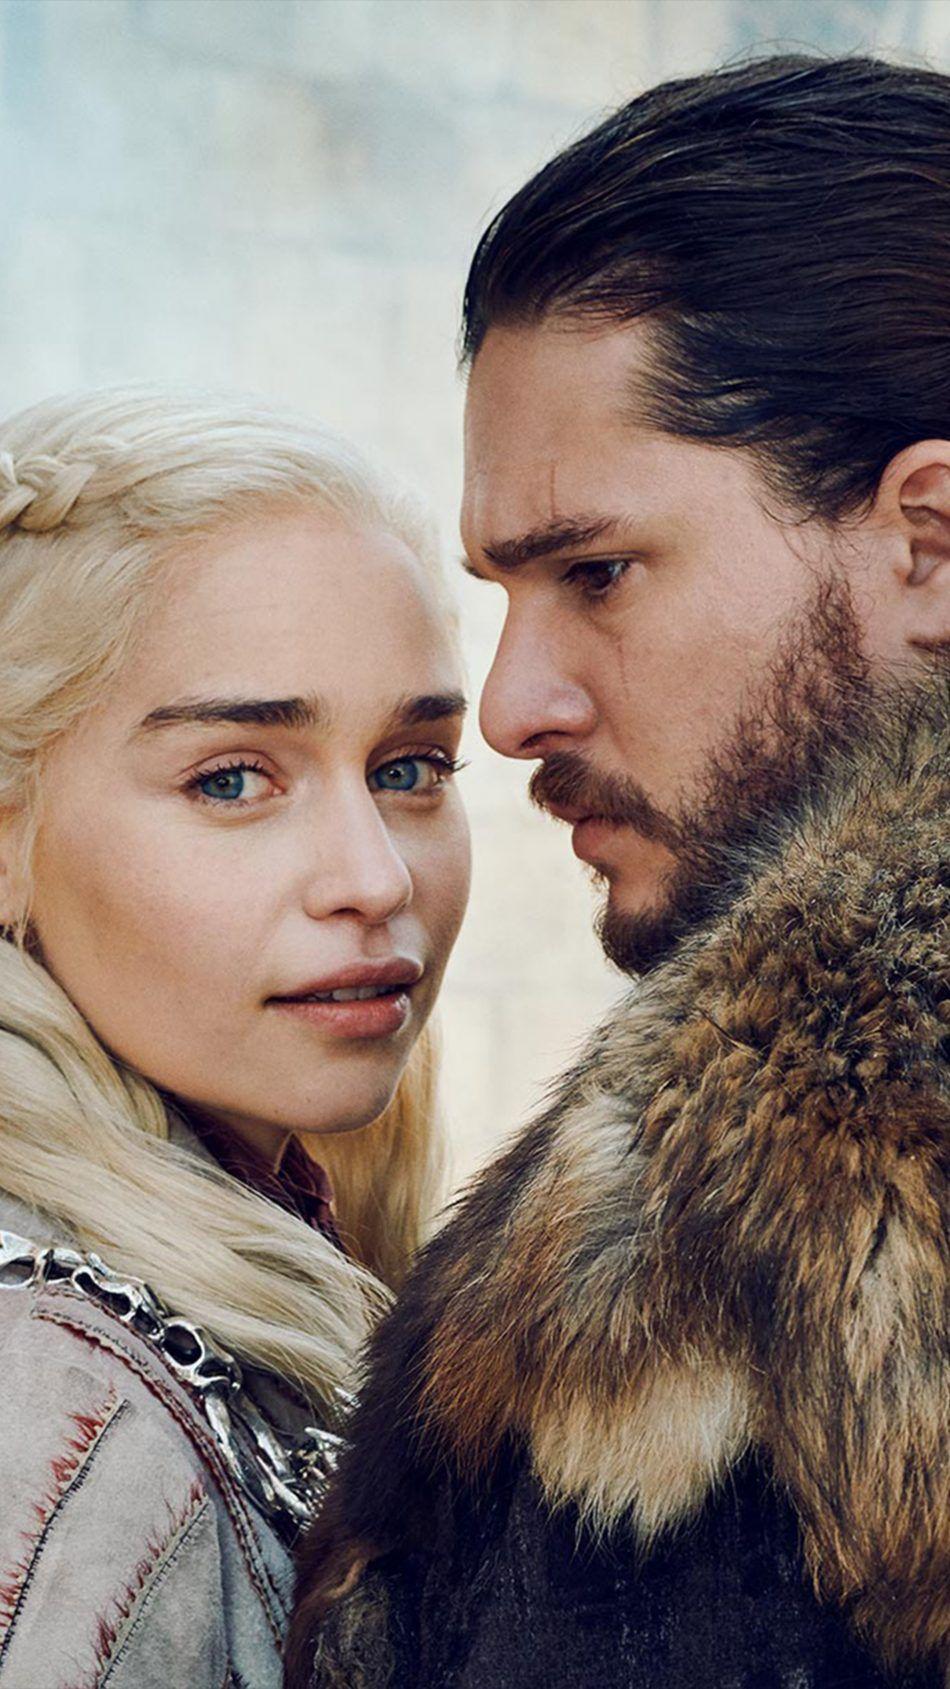 Daenerys Targaryen Jon Snow Game Of Thrones S8 4k Ultra Hd Mobile Wallpaper Snow Wallpaper Iphone Snow Wallpaper Hd Game Of Thrones Poster